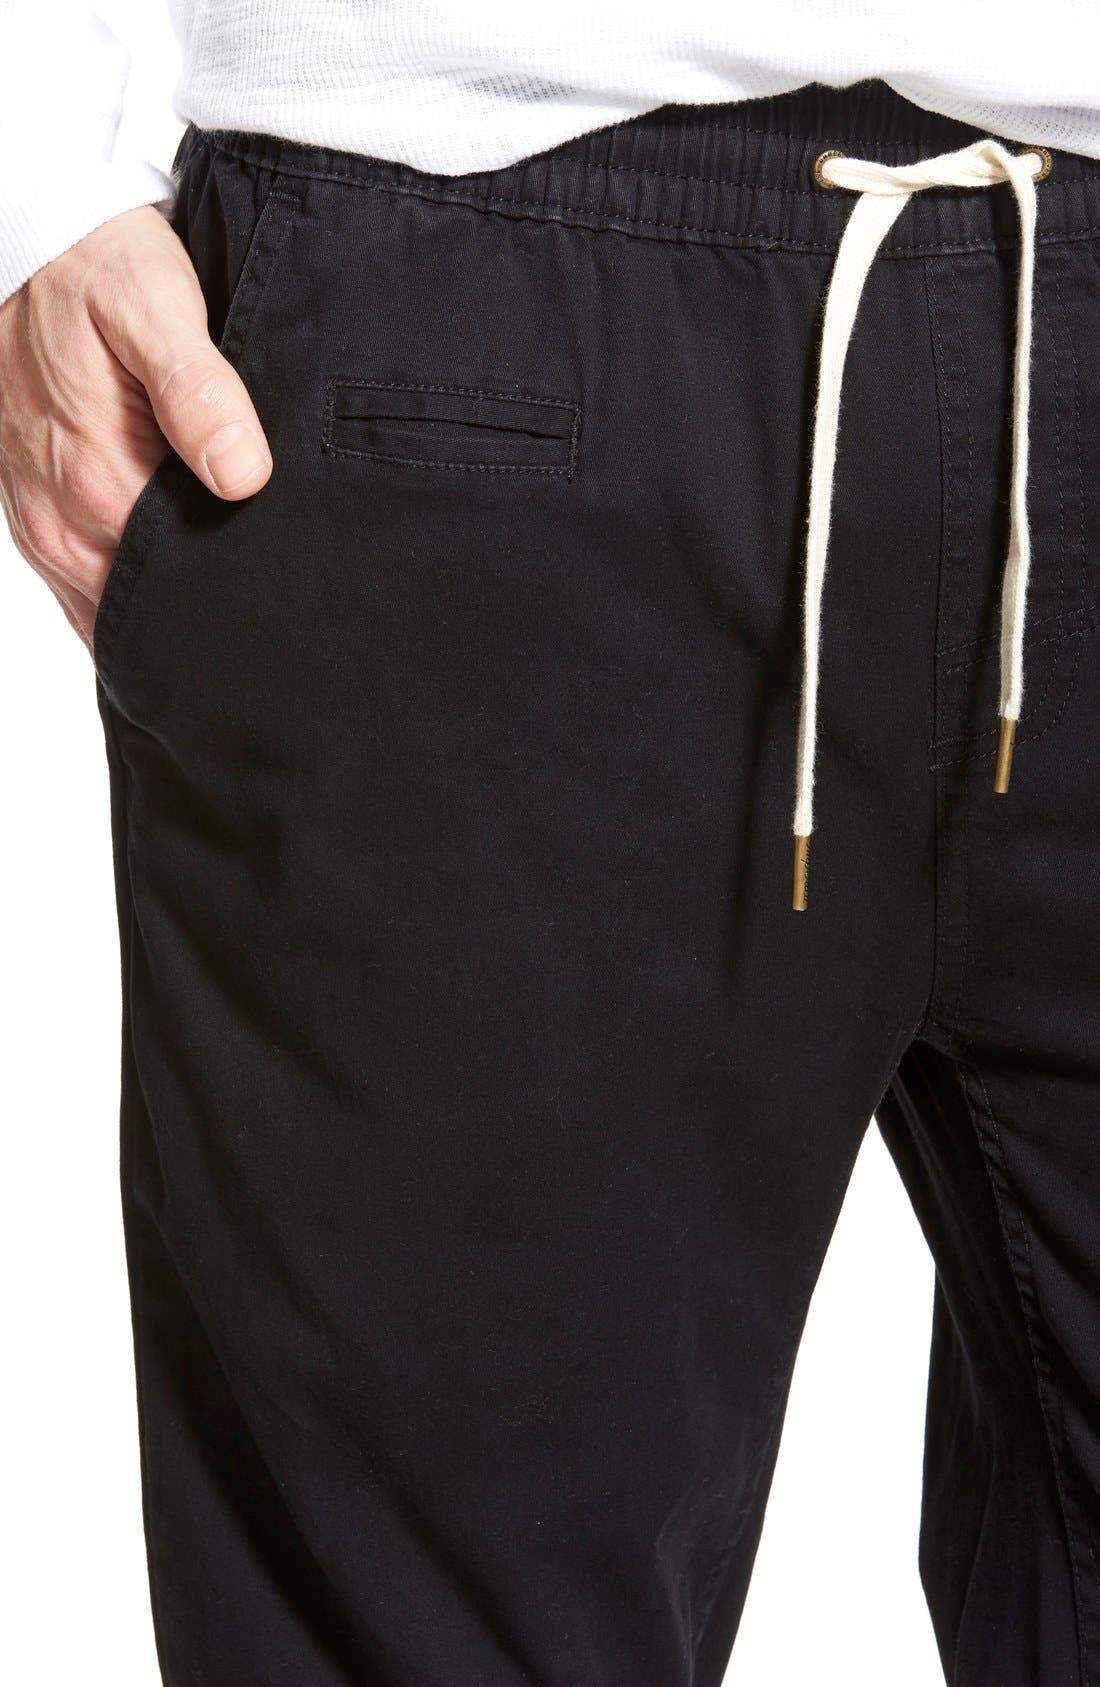 'Denny' Woven Jogger Pants,                             Alternate thumbnail 4, color,                             001